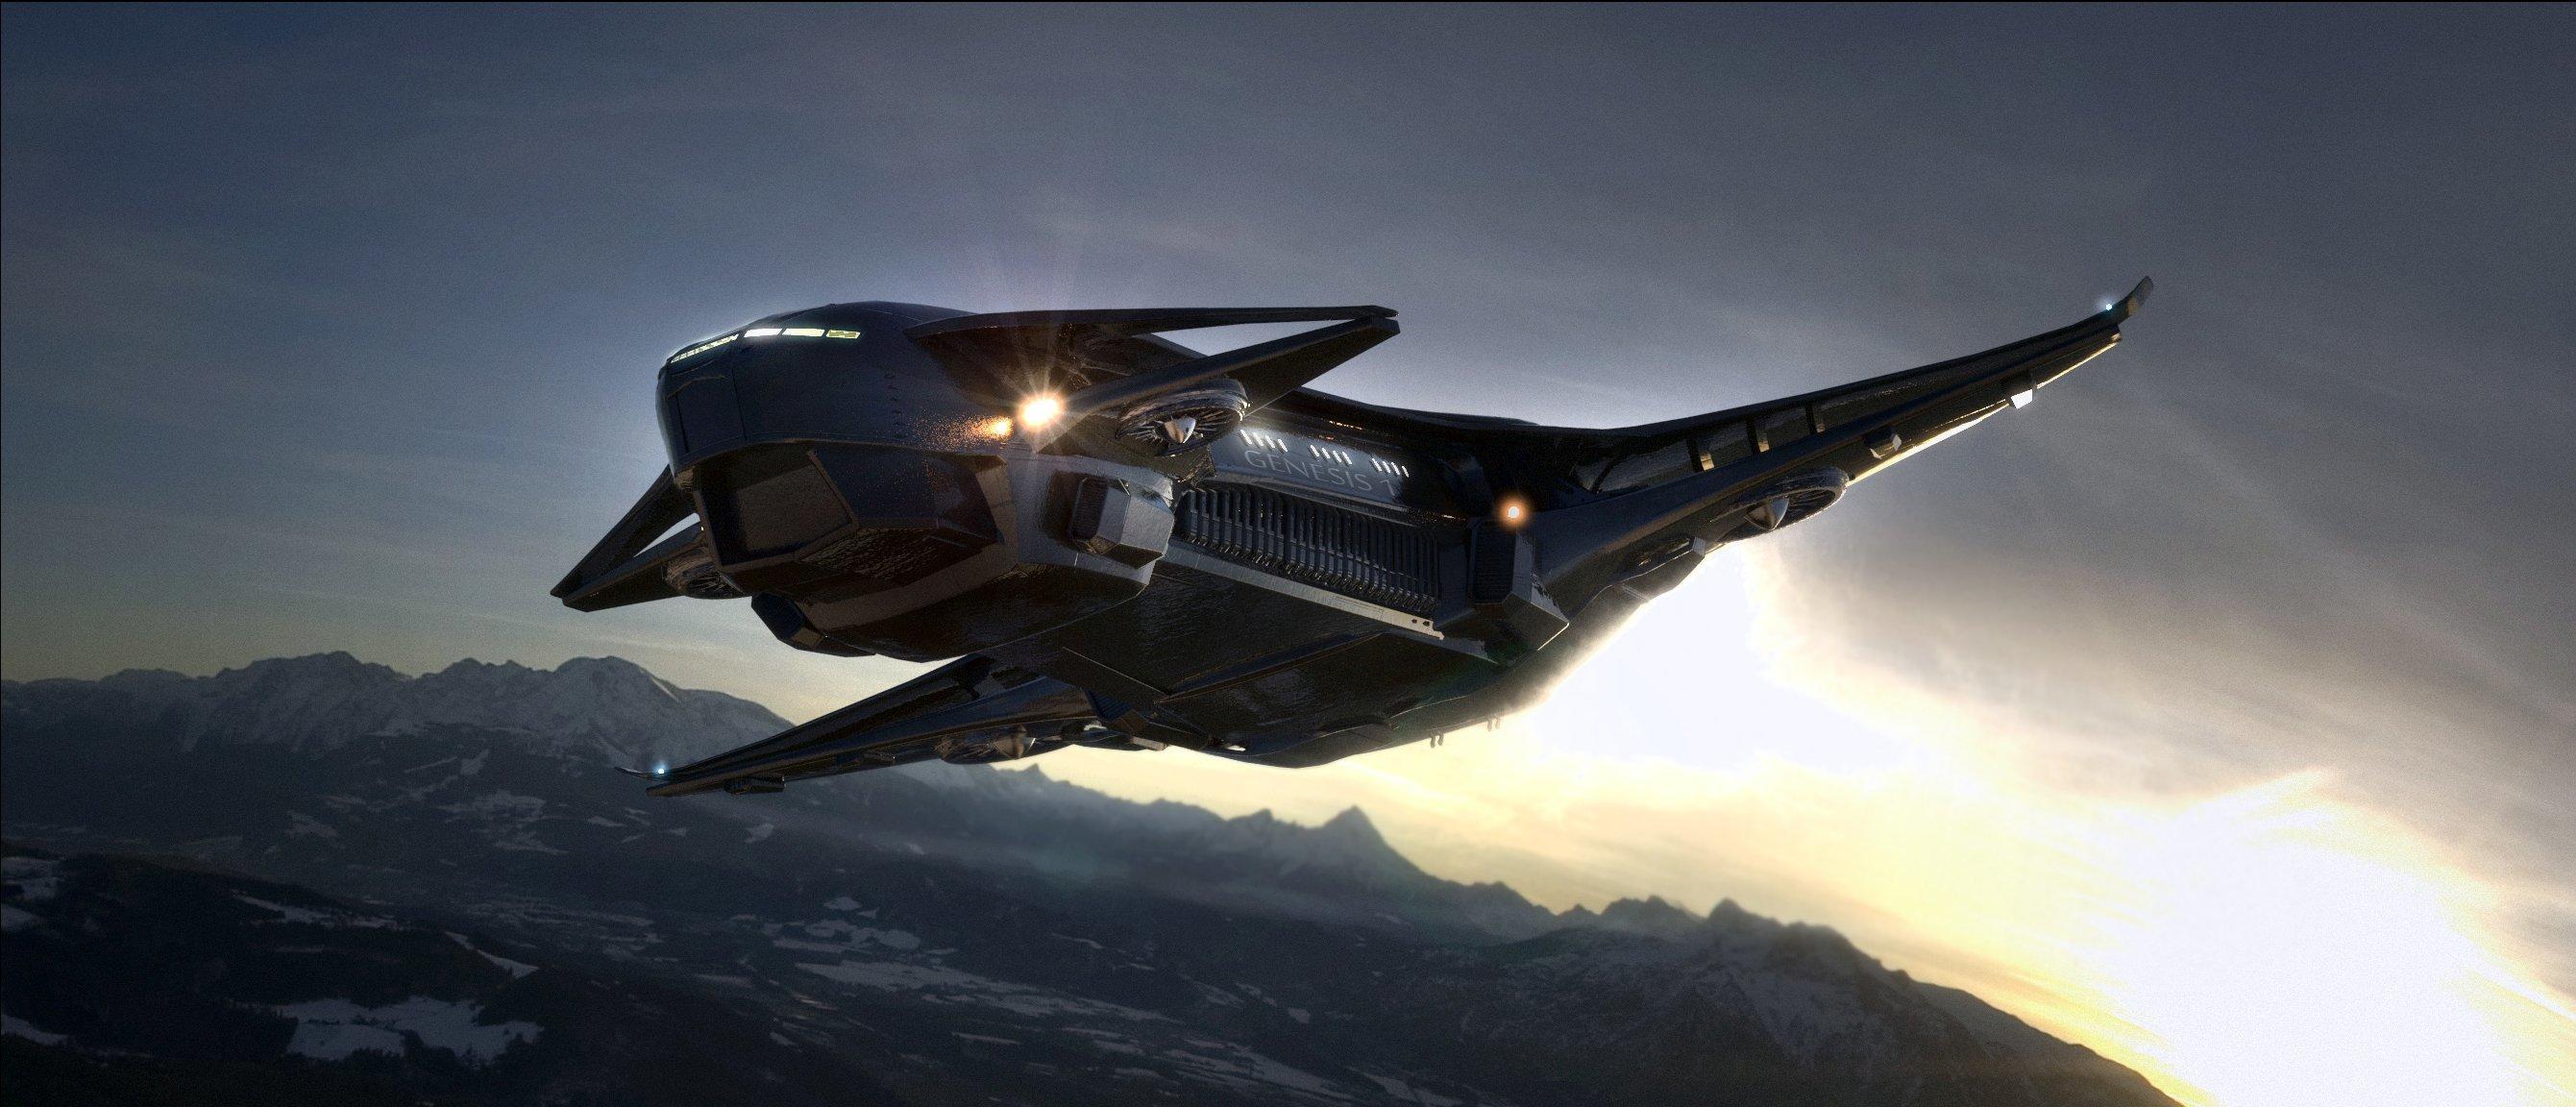 large.Starliner_action4.jpg